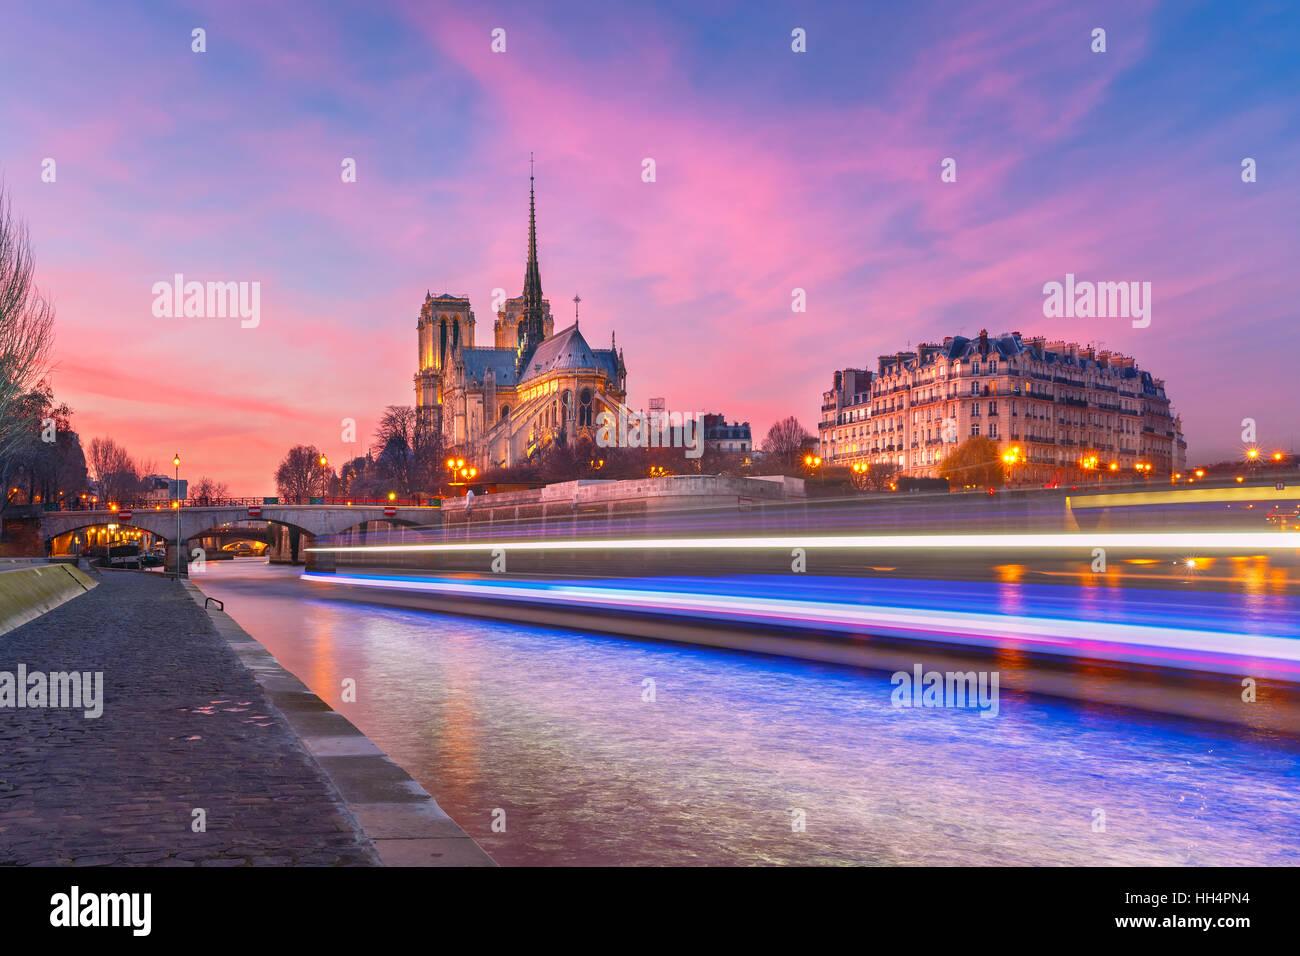 Kathedrale von Notre Dame de Paris bei Sonnenuntergang, Frankreich Stockbild